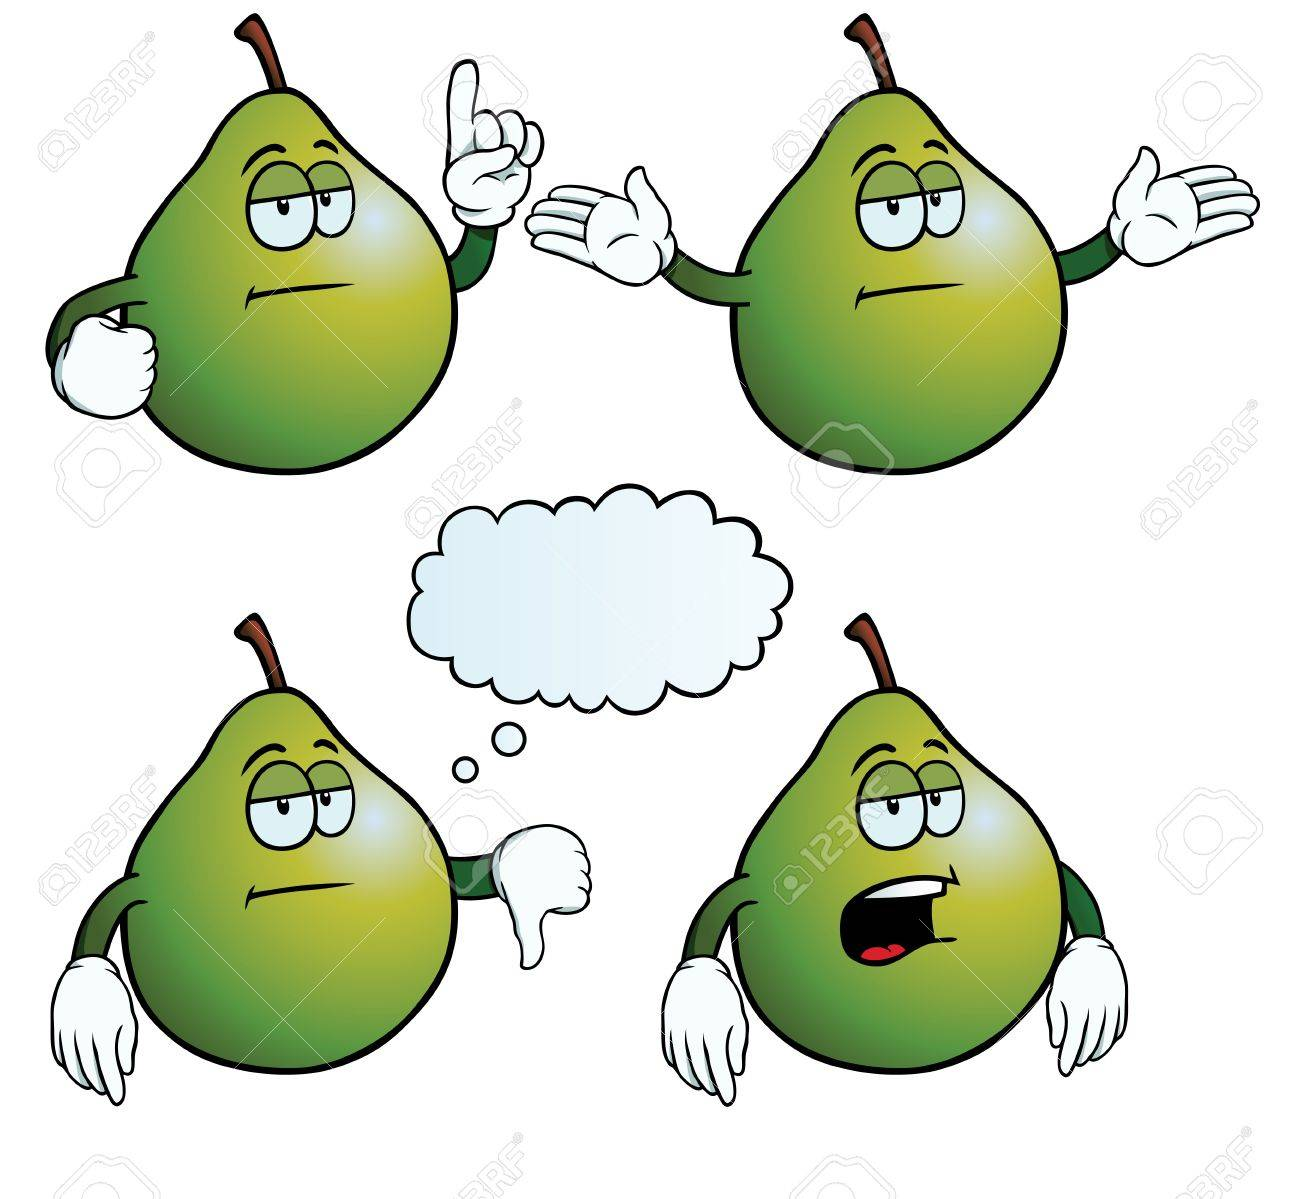 Bored pear set Stock Vector - 18663451